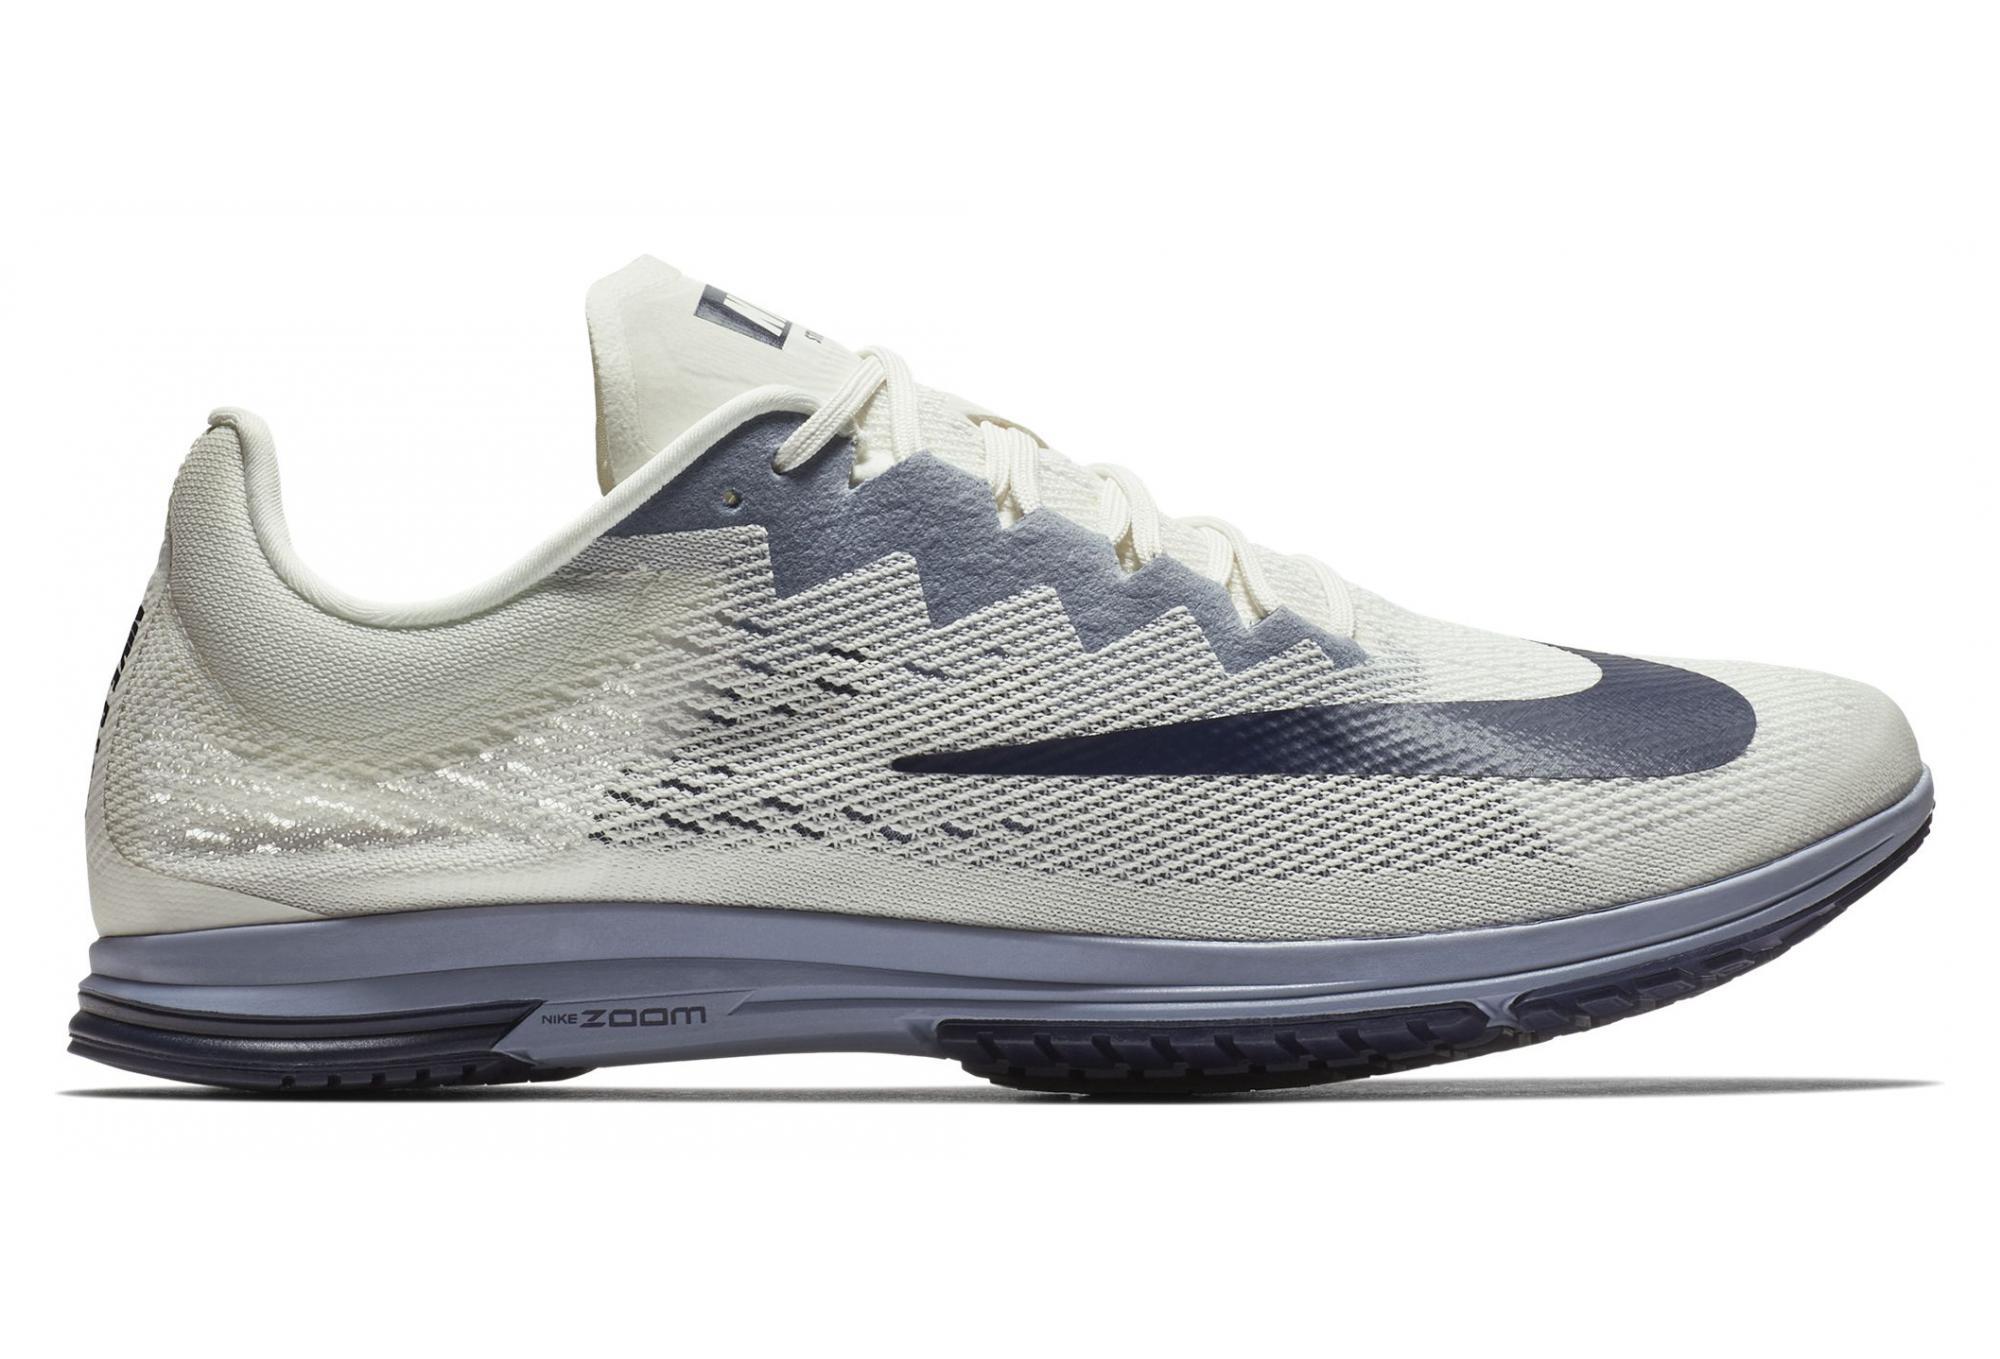 3488b7203630ed Nike Shoes Zoom Streak LT 4 White Blue Unisex